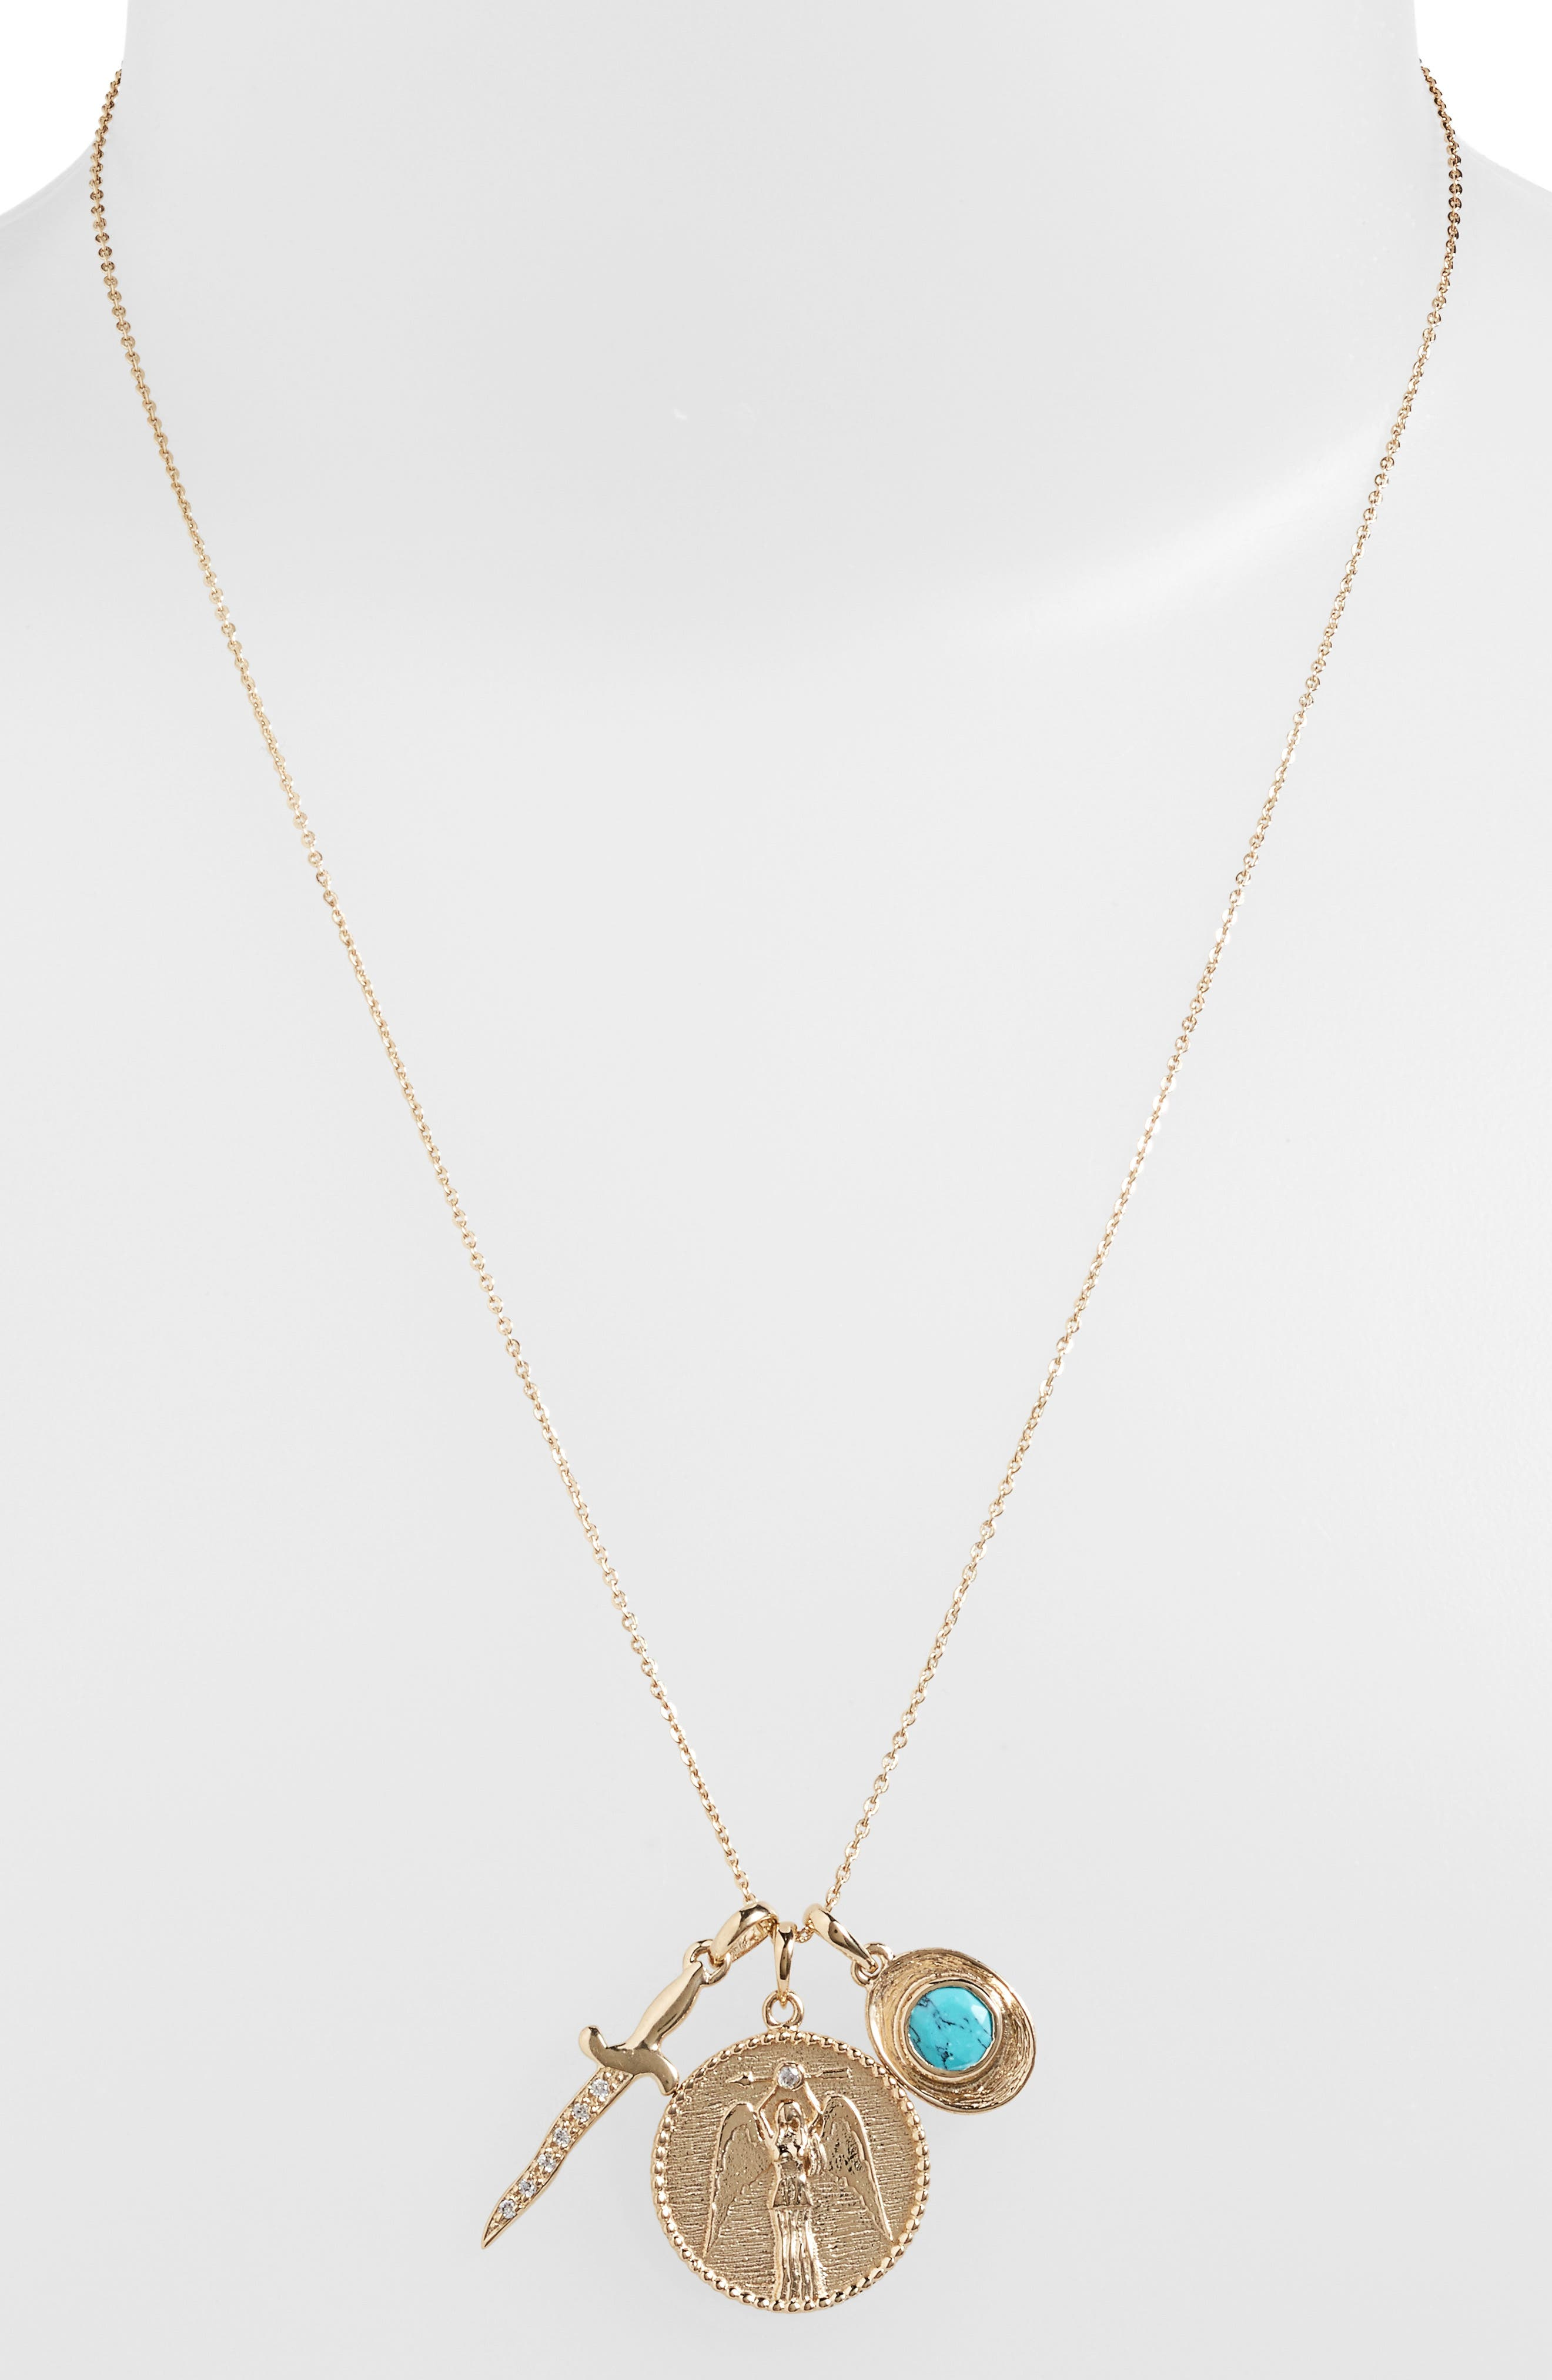 Alternate Image 1 Selected - Melinda Maria Goddess of Strength Cluster Pendant Necklace